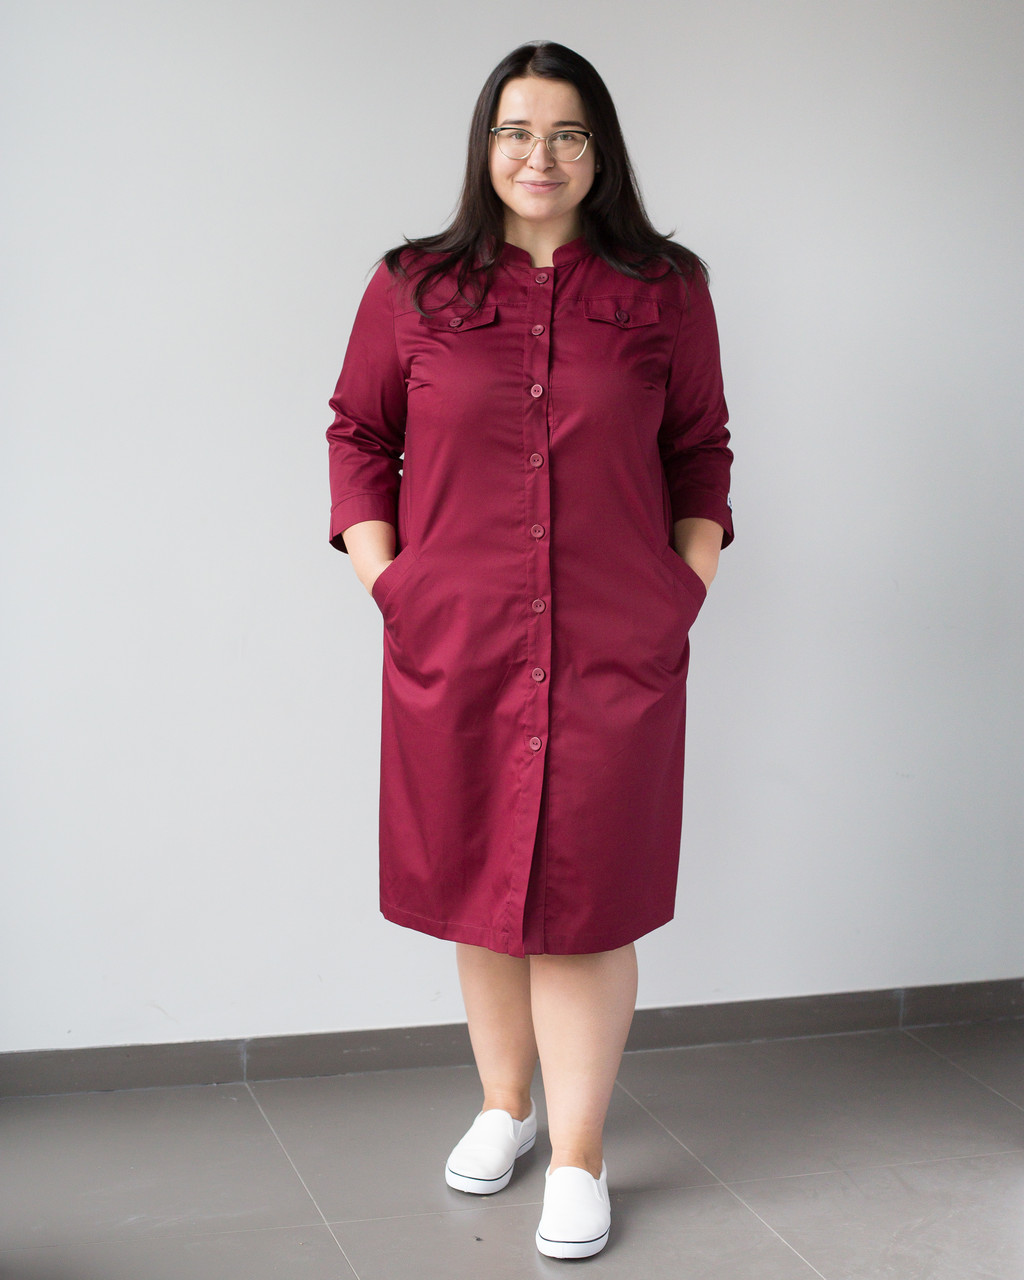 Медичний жіночий халат Валері марсала +SIZE